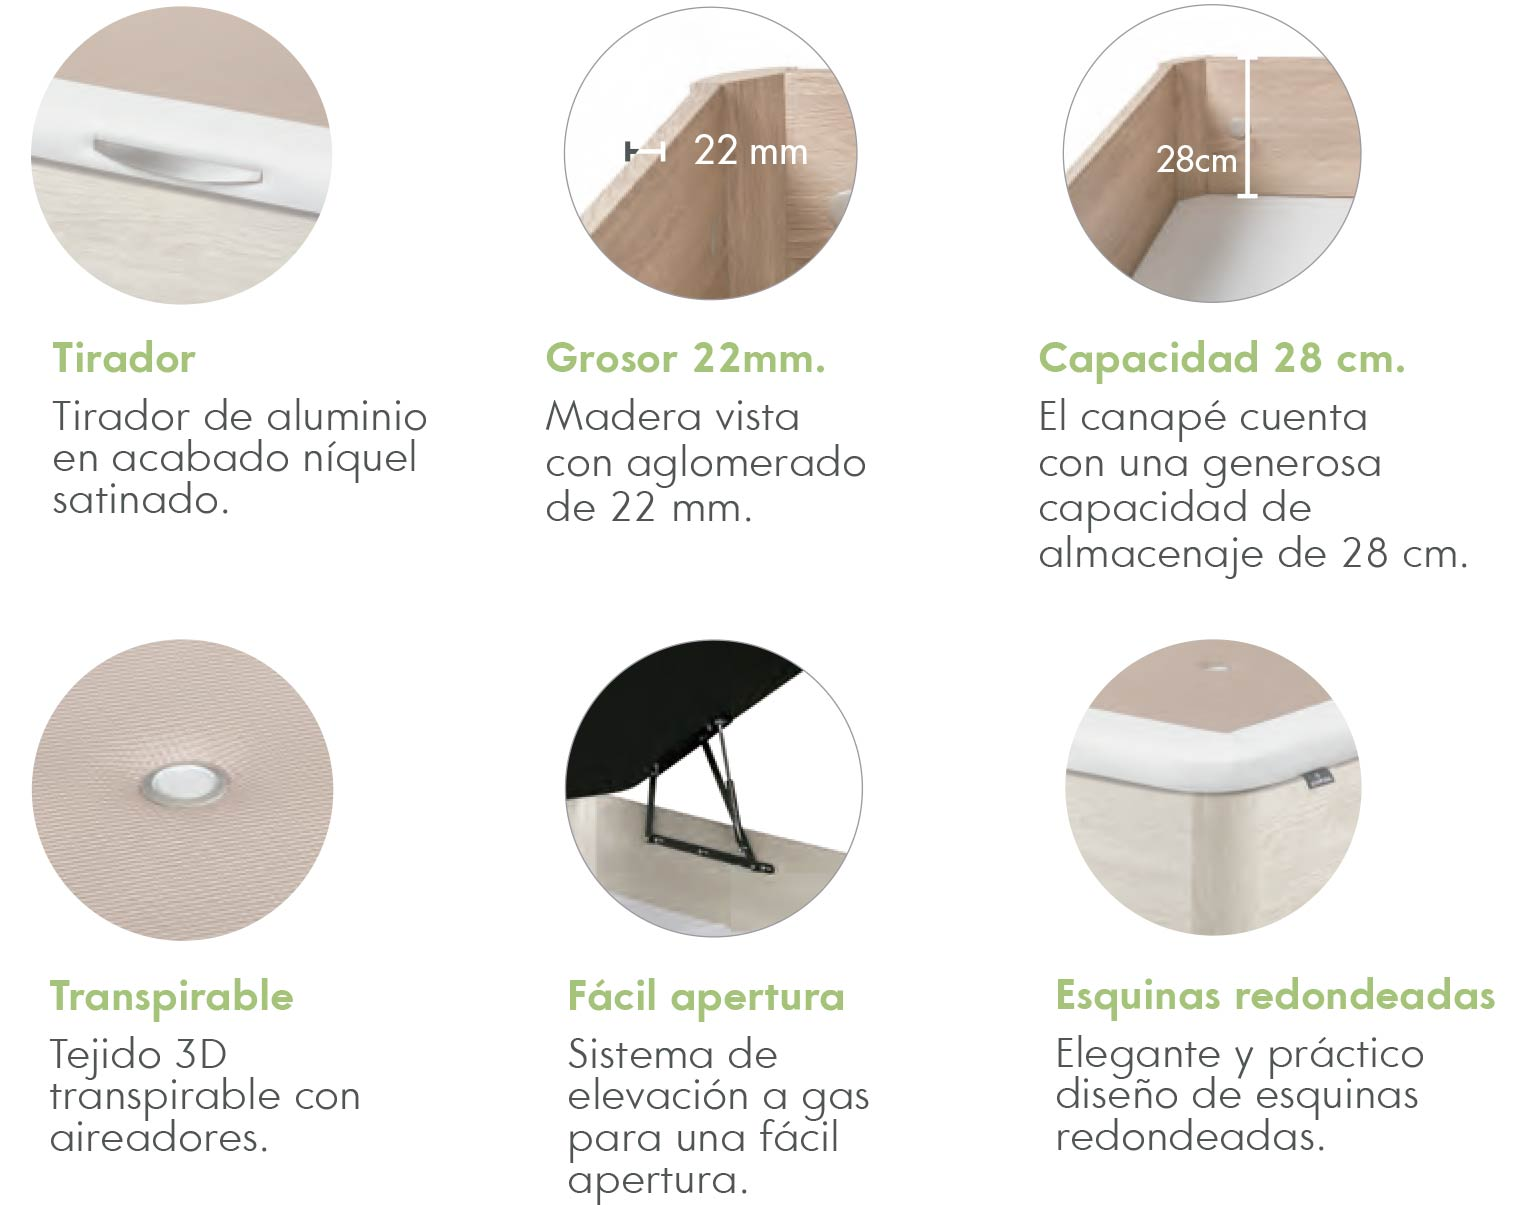 Canapé Line caracteristicas